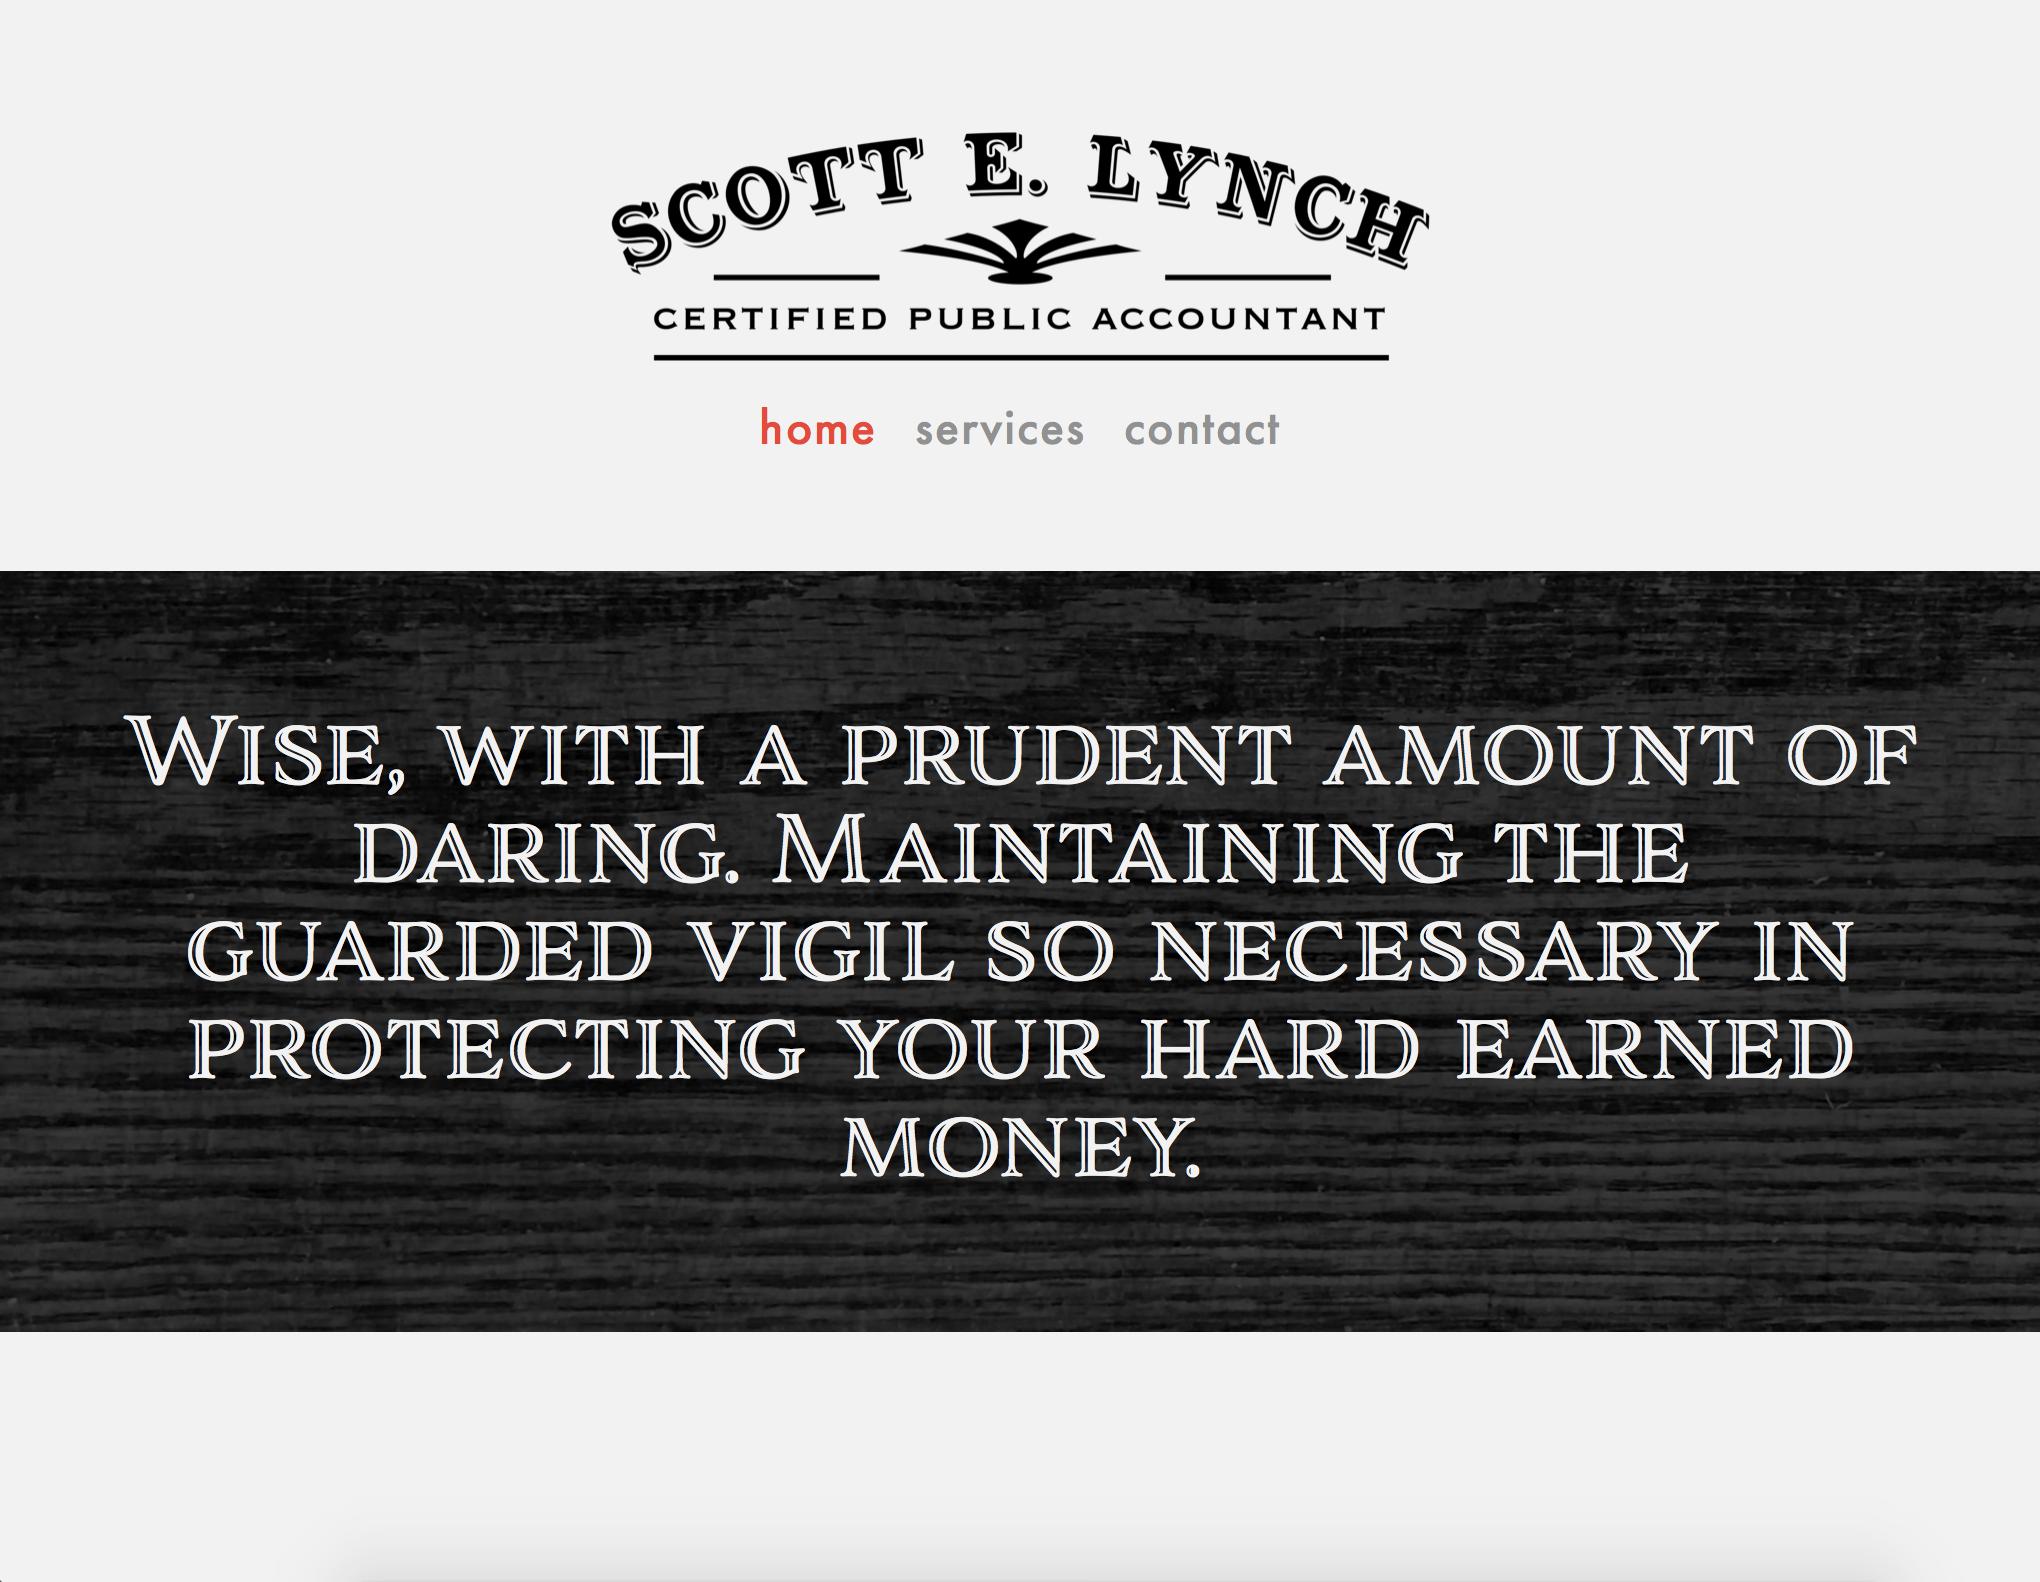 Scott Lynch CPA